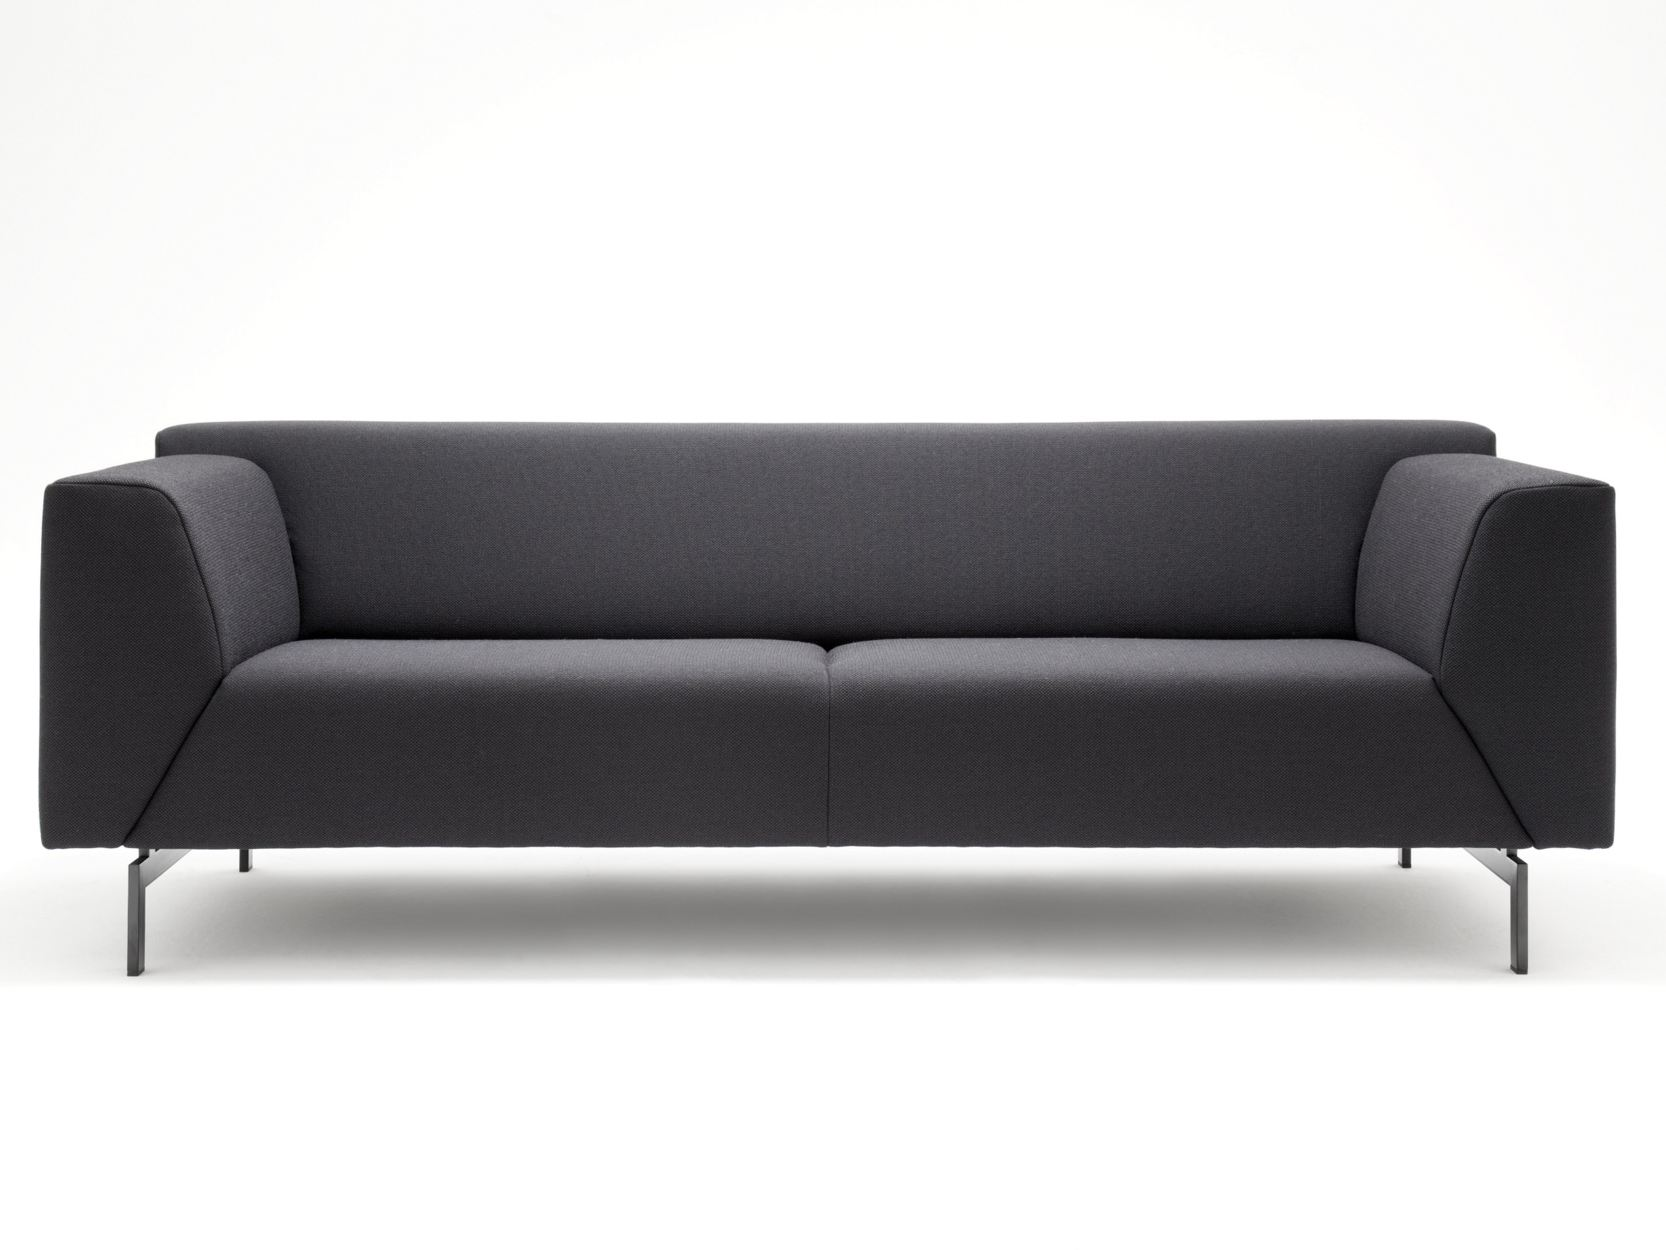 sofa linea hereo sofa. Black Bedroom Furniture Sets. Home Design Ideas